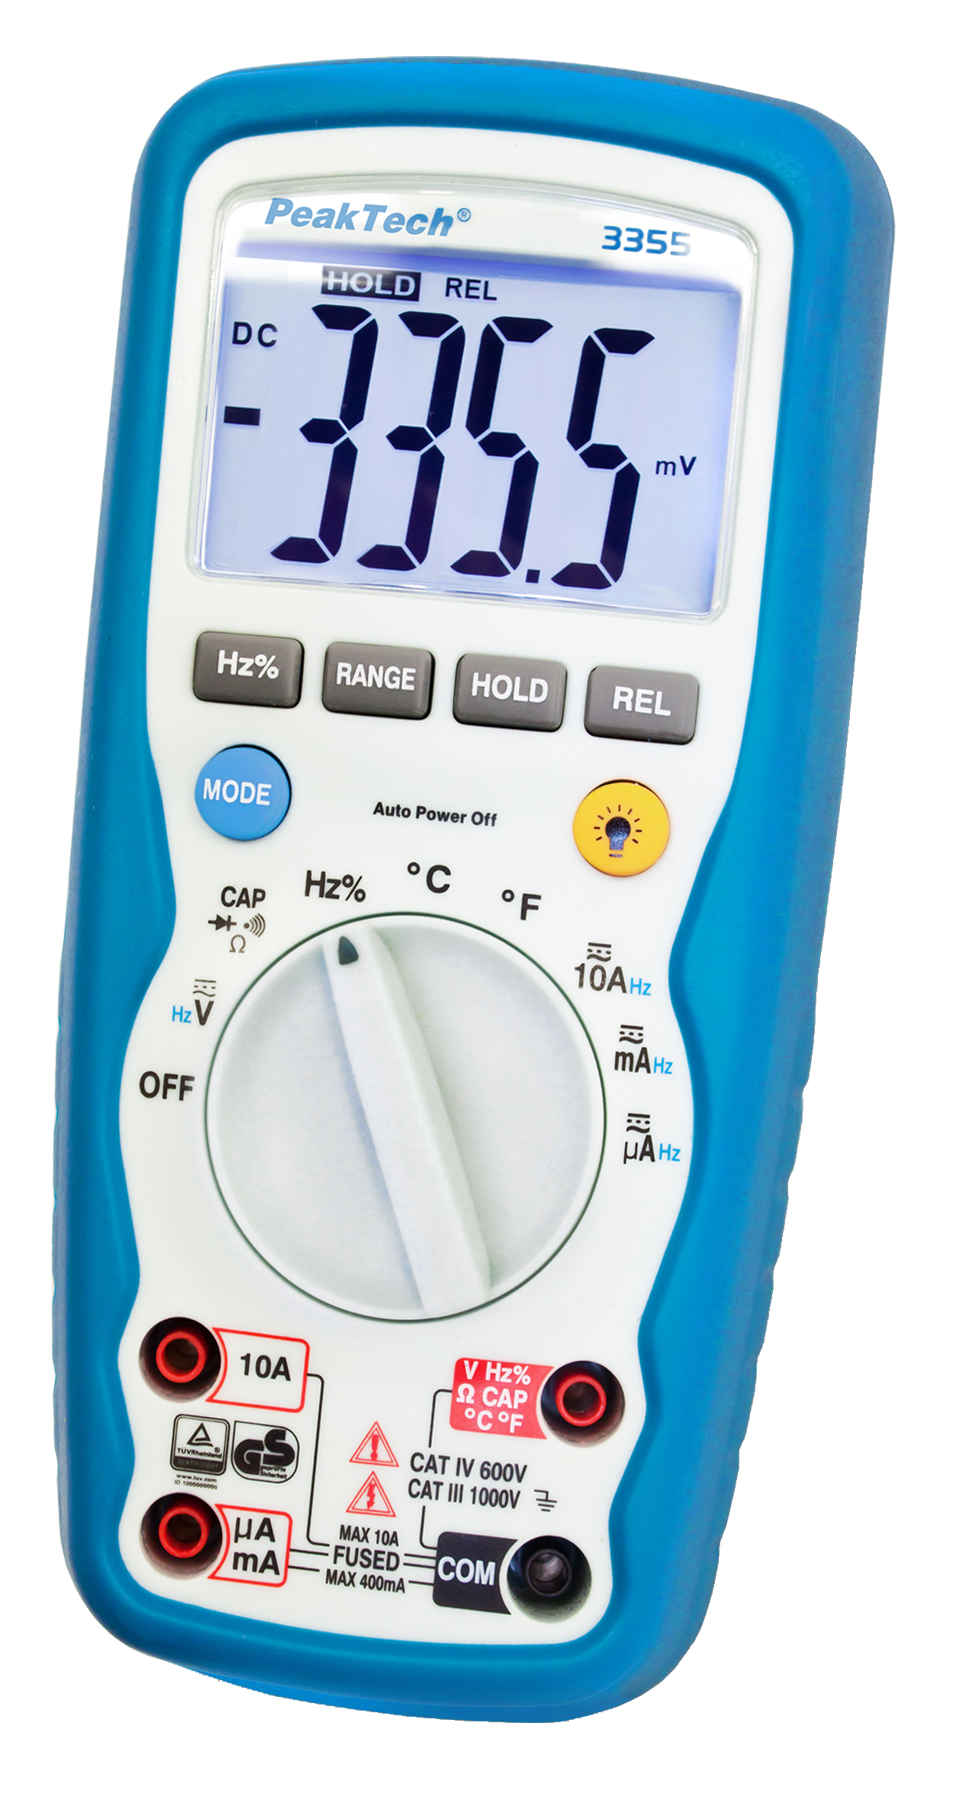 «PeakTech® P 3355» Digital multimeter, 4,000 counts, IP67